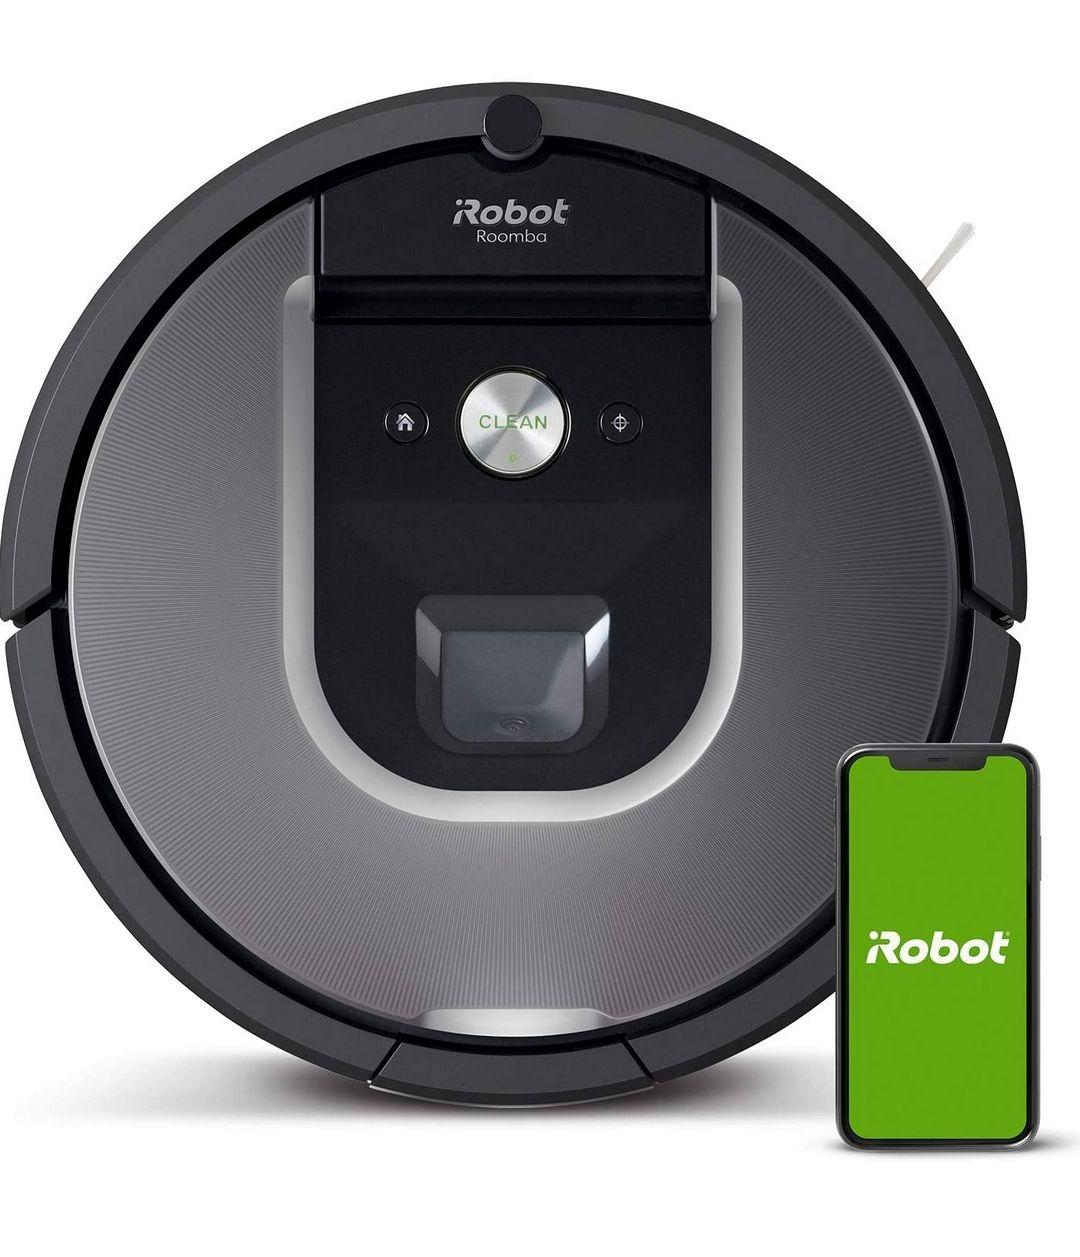 Aspirateur robot connecté iRobot Roomba 960